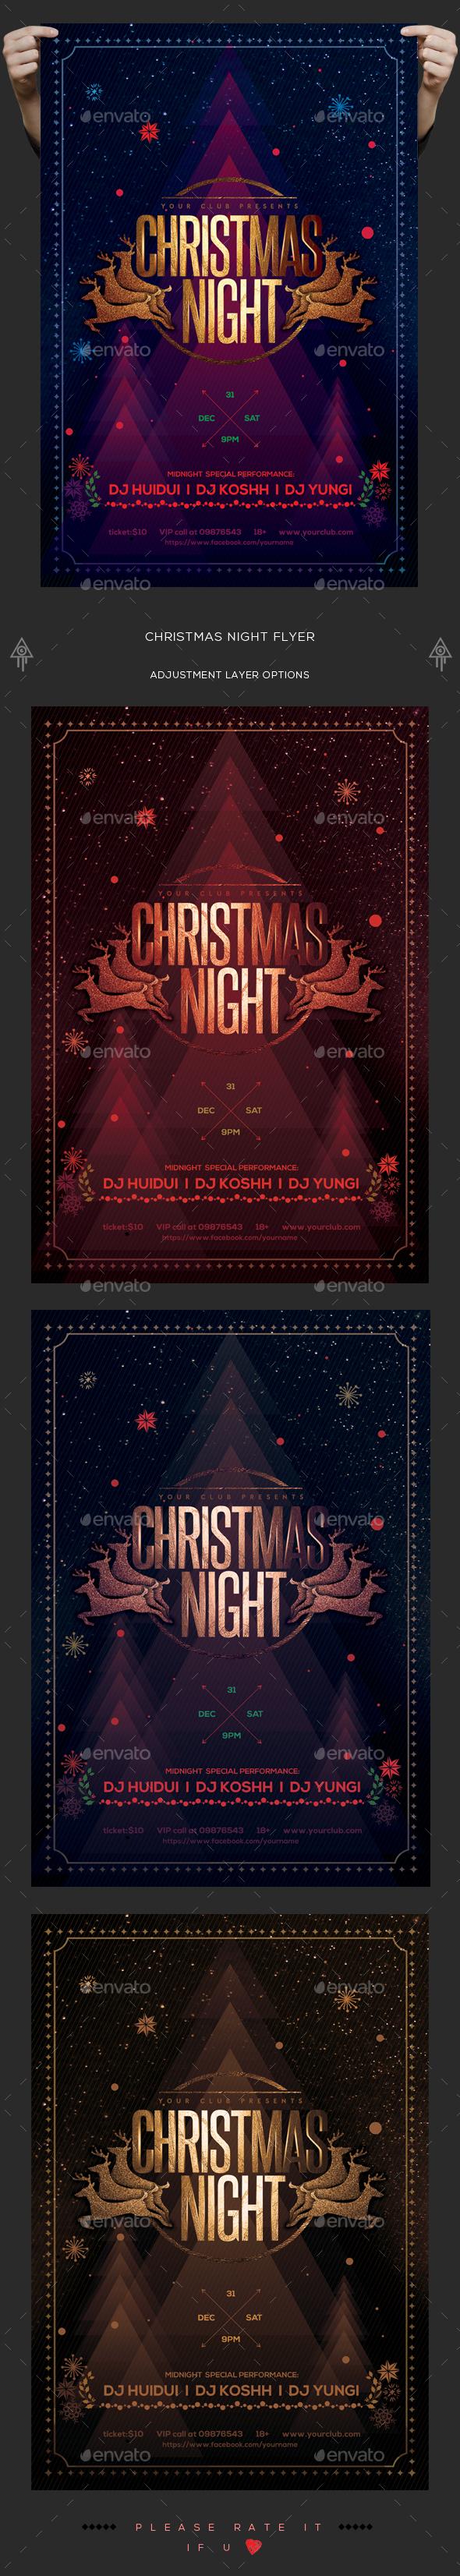 Christmas Night Flyer - Holidays Events